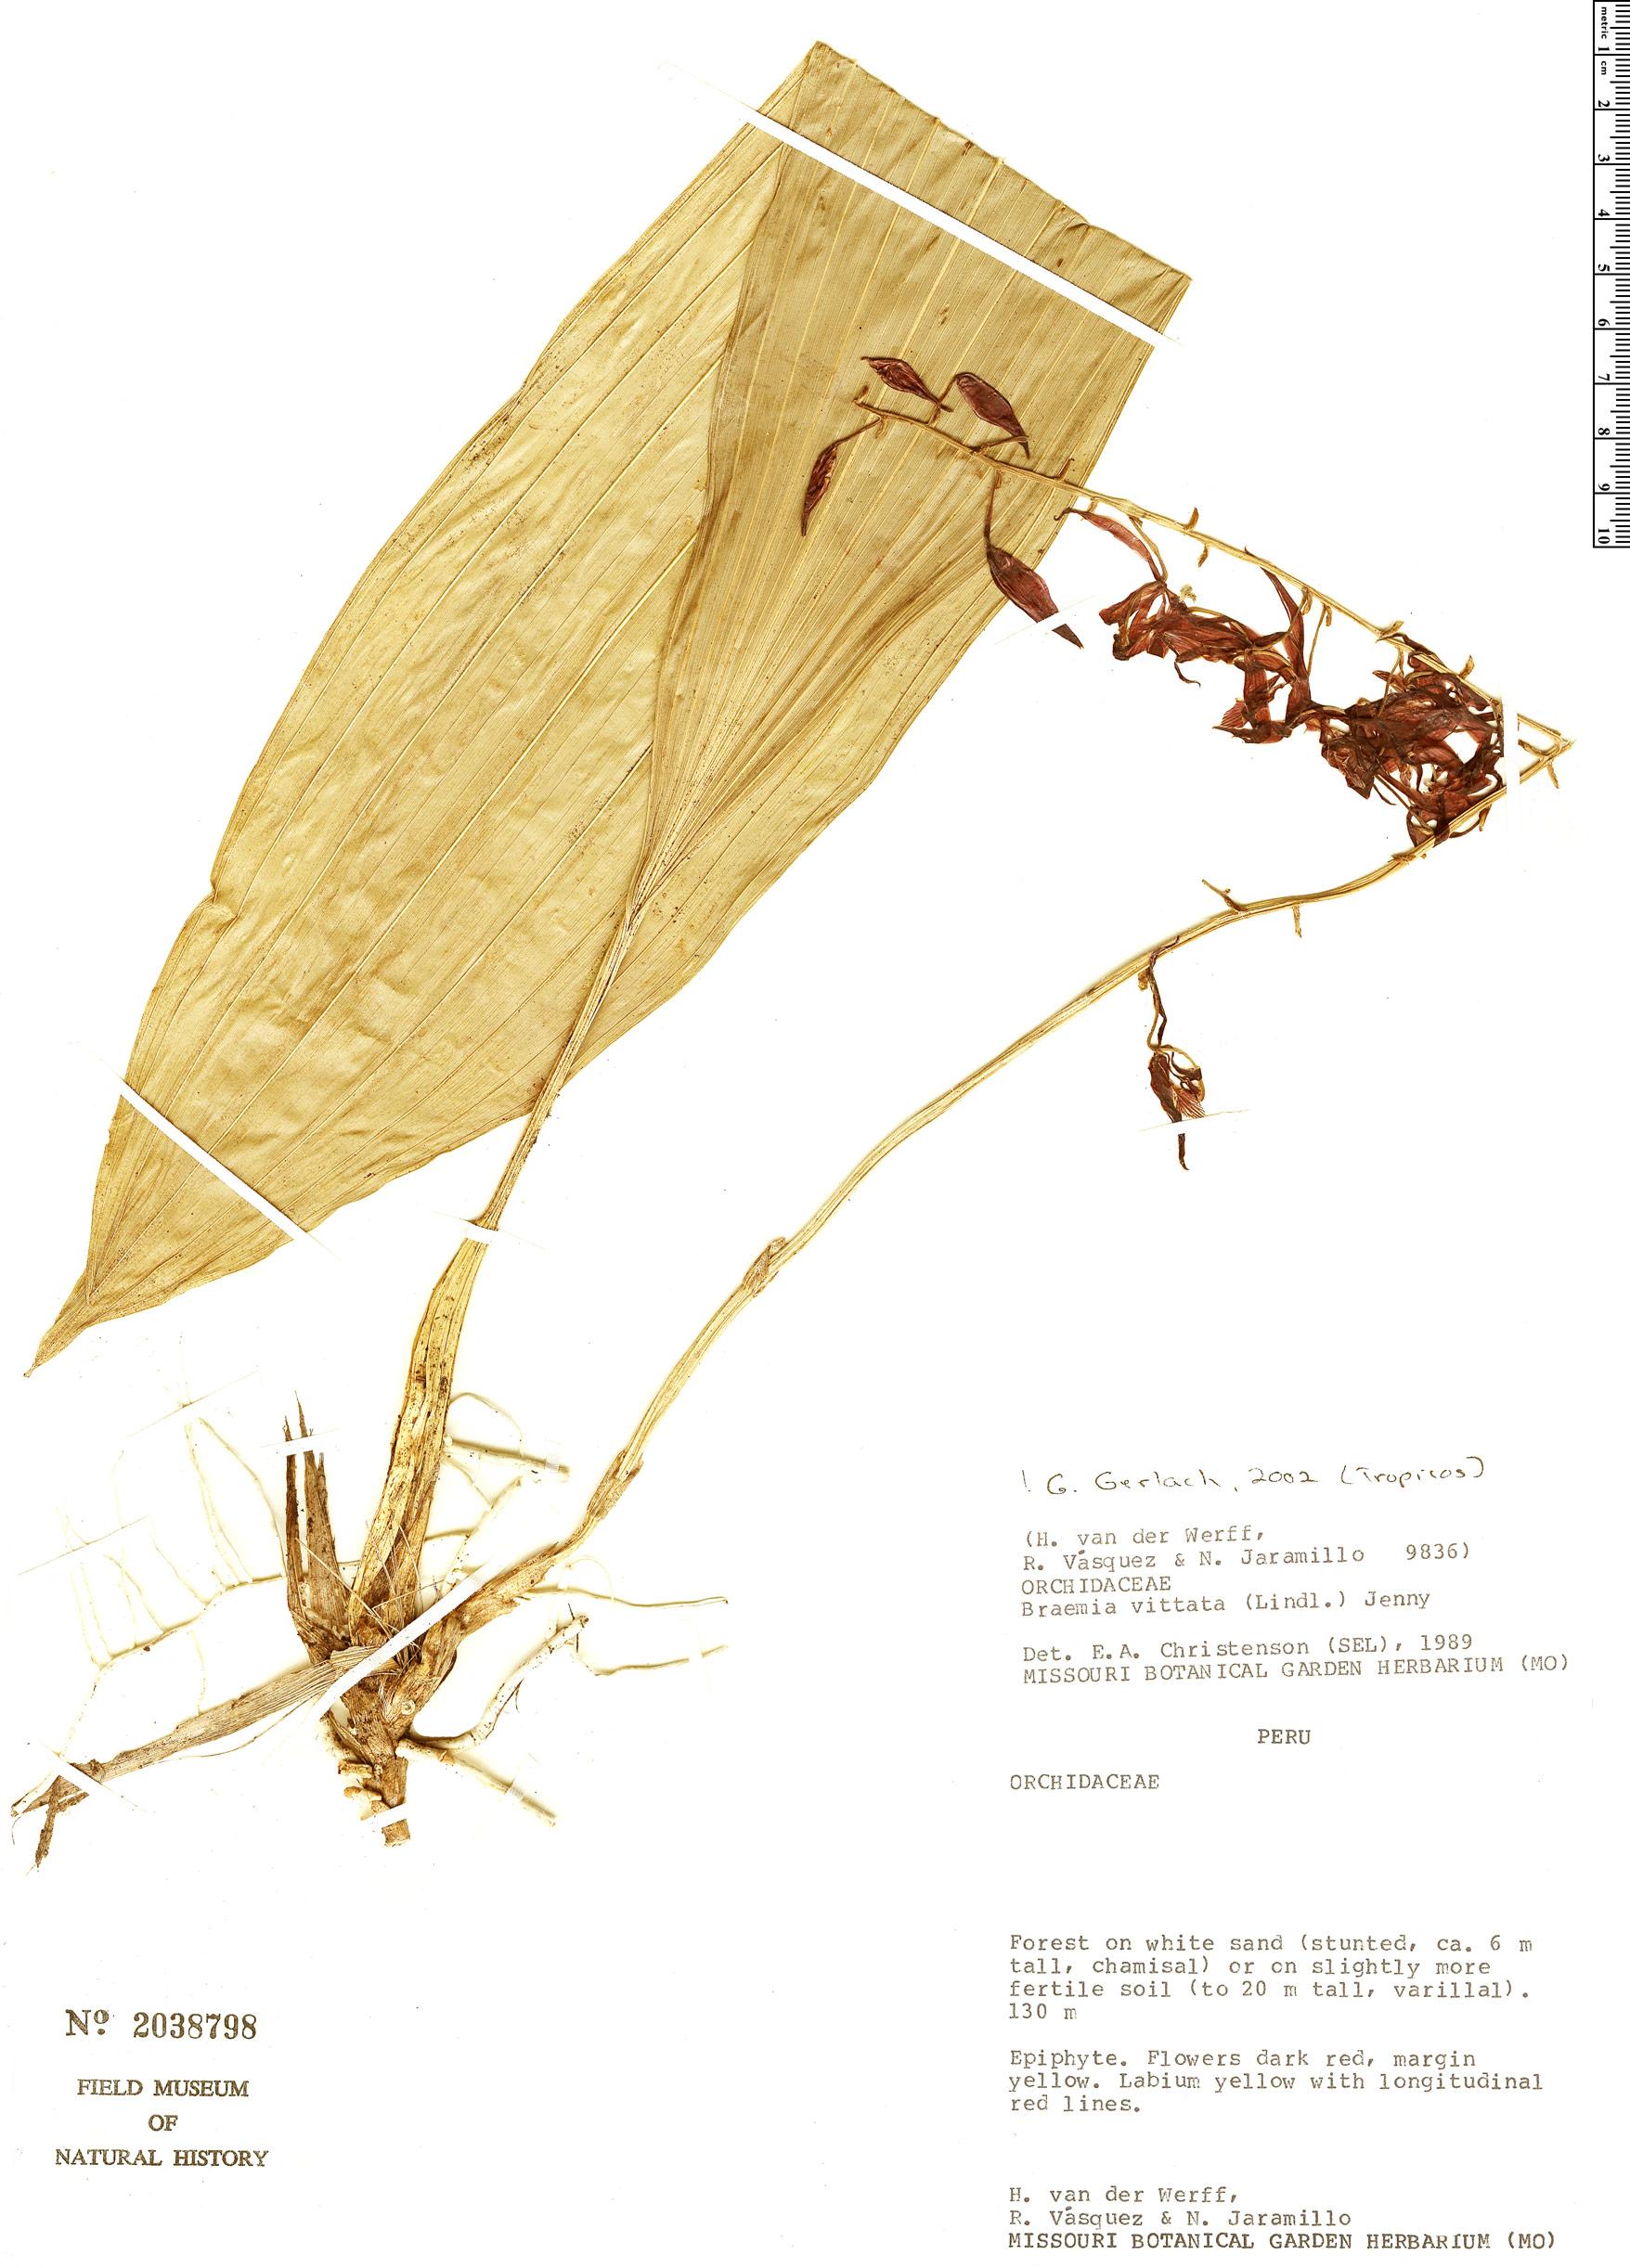 Specimen: Braemia vittata